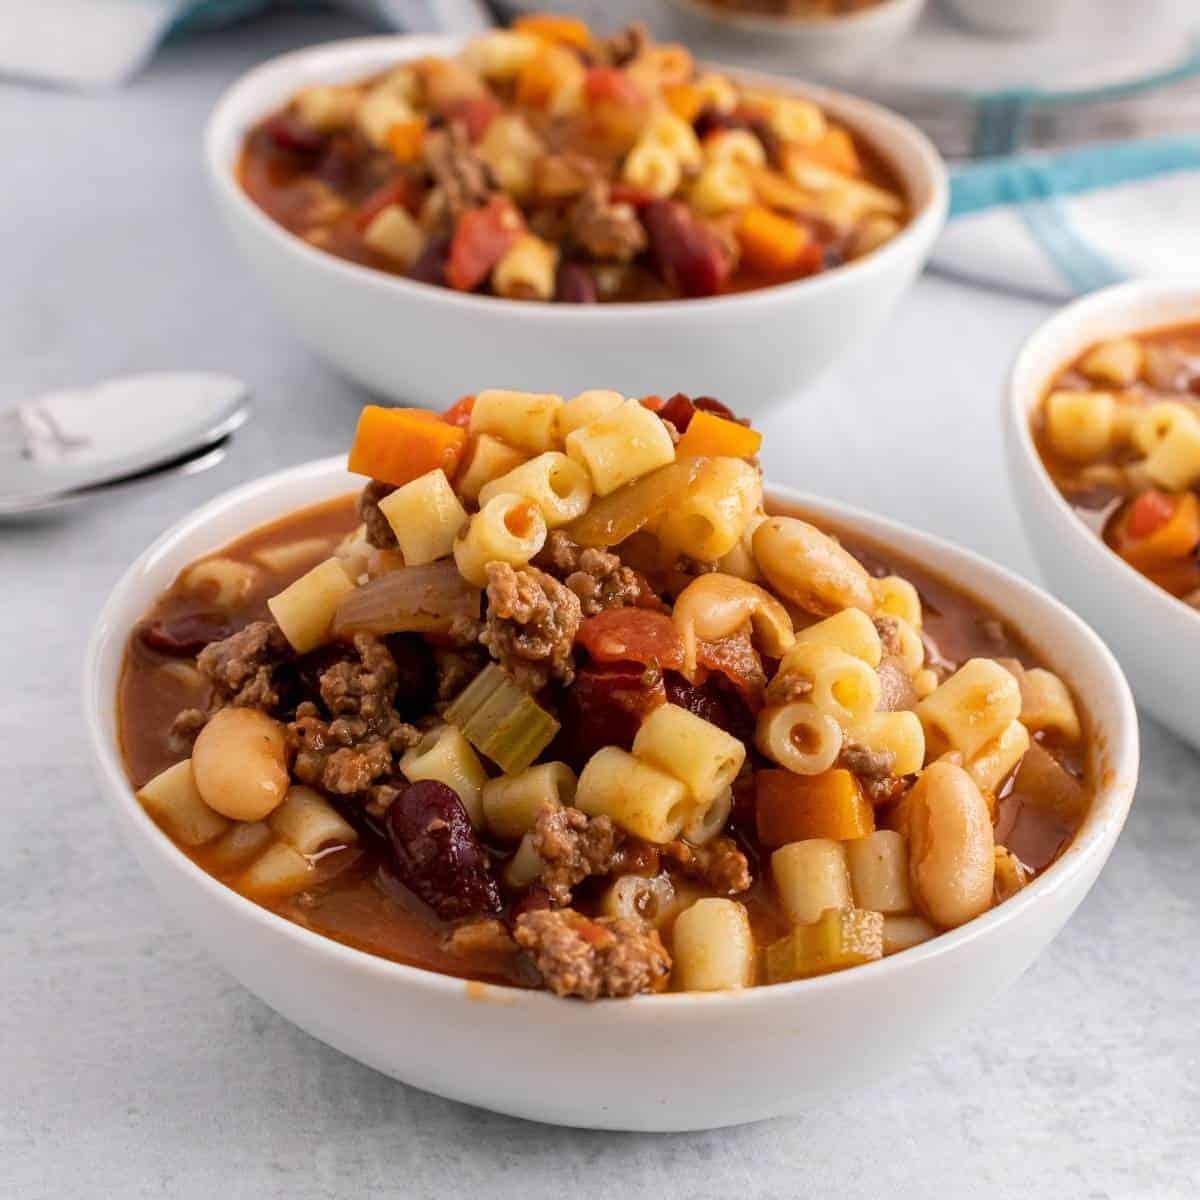 Pasta e fagioli. The best copycat Olive Garden soup recipe.